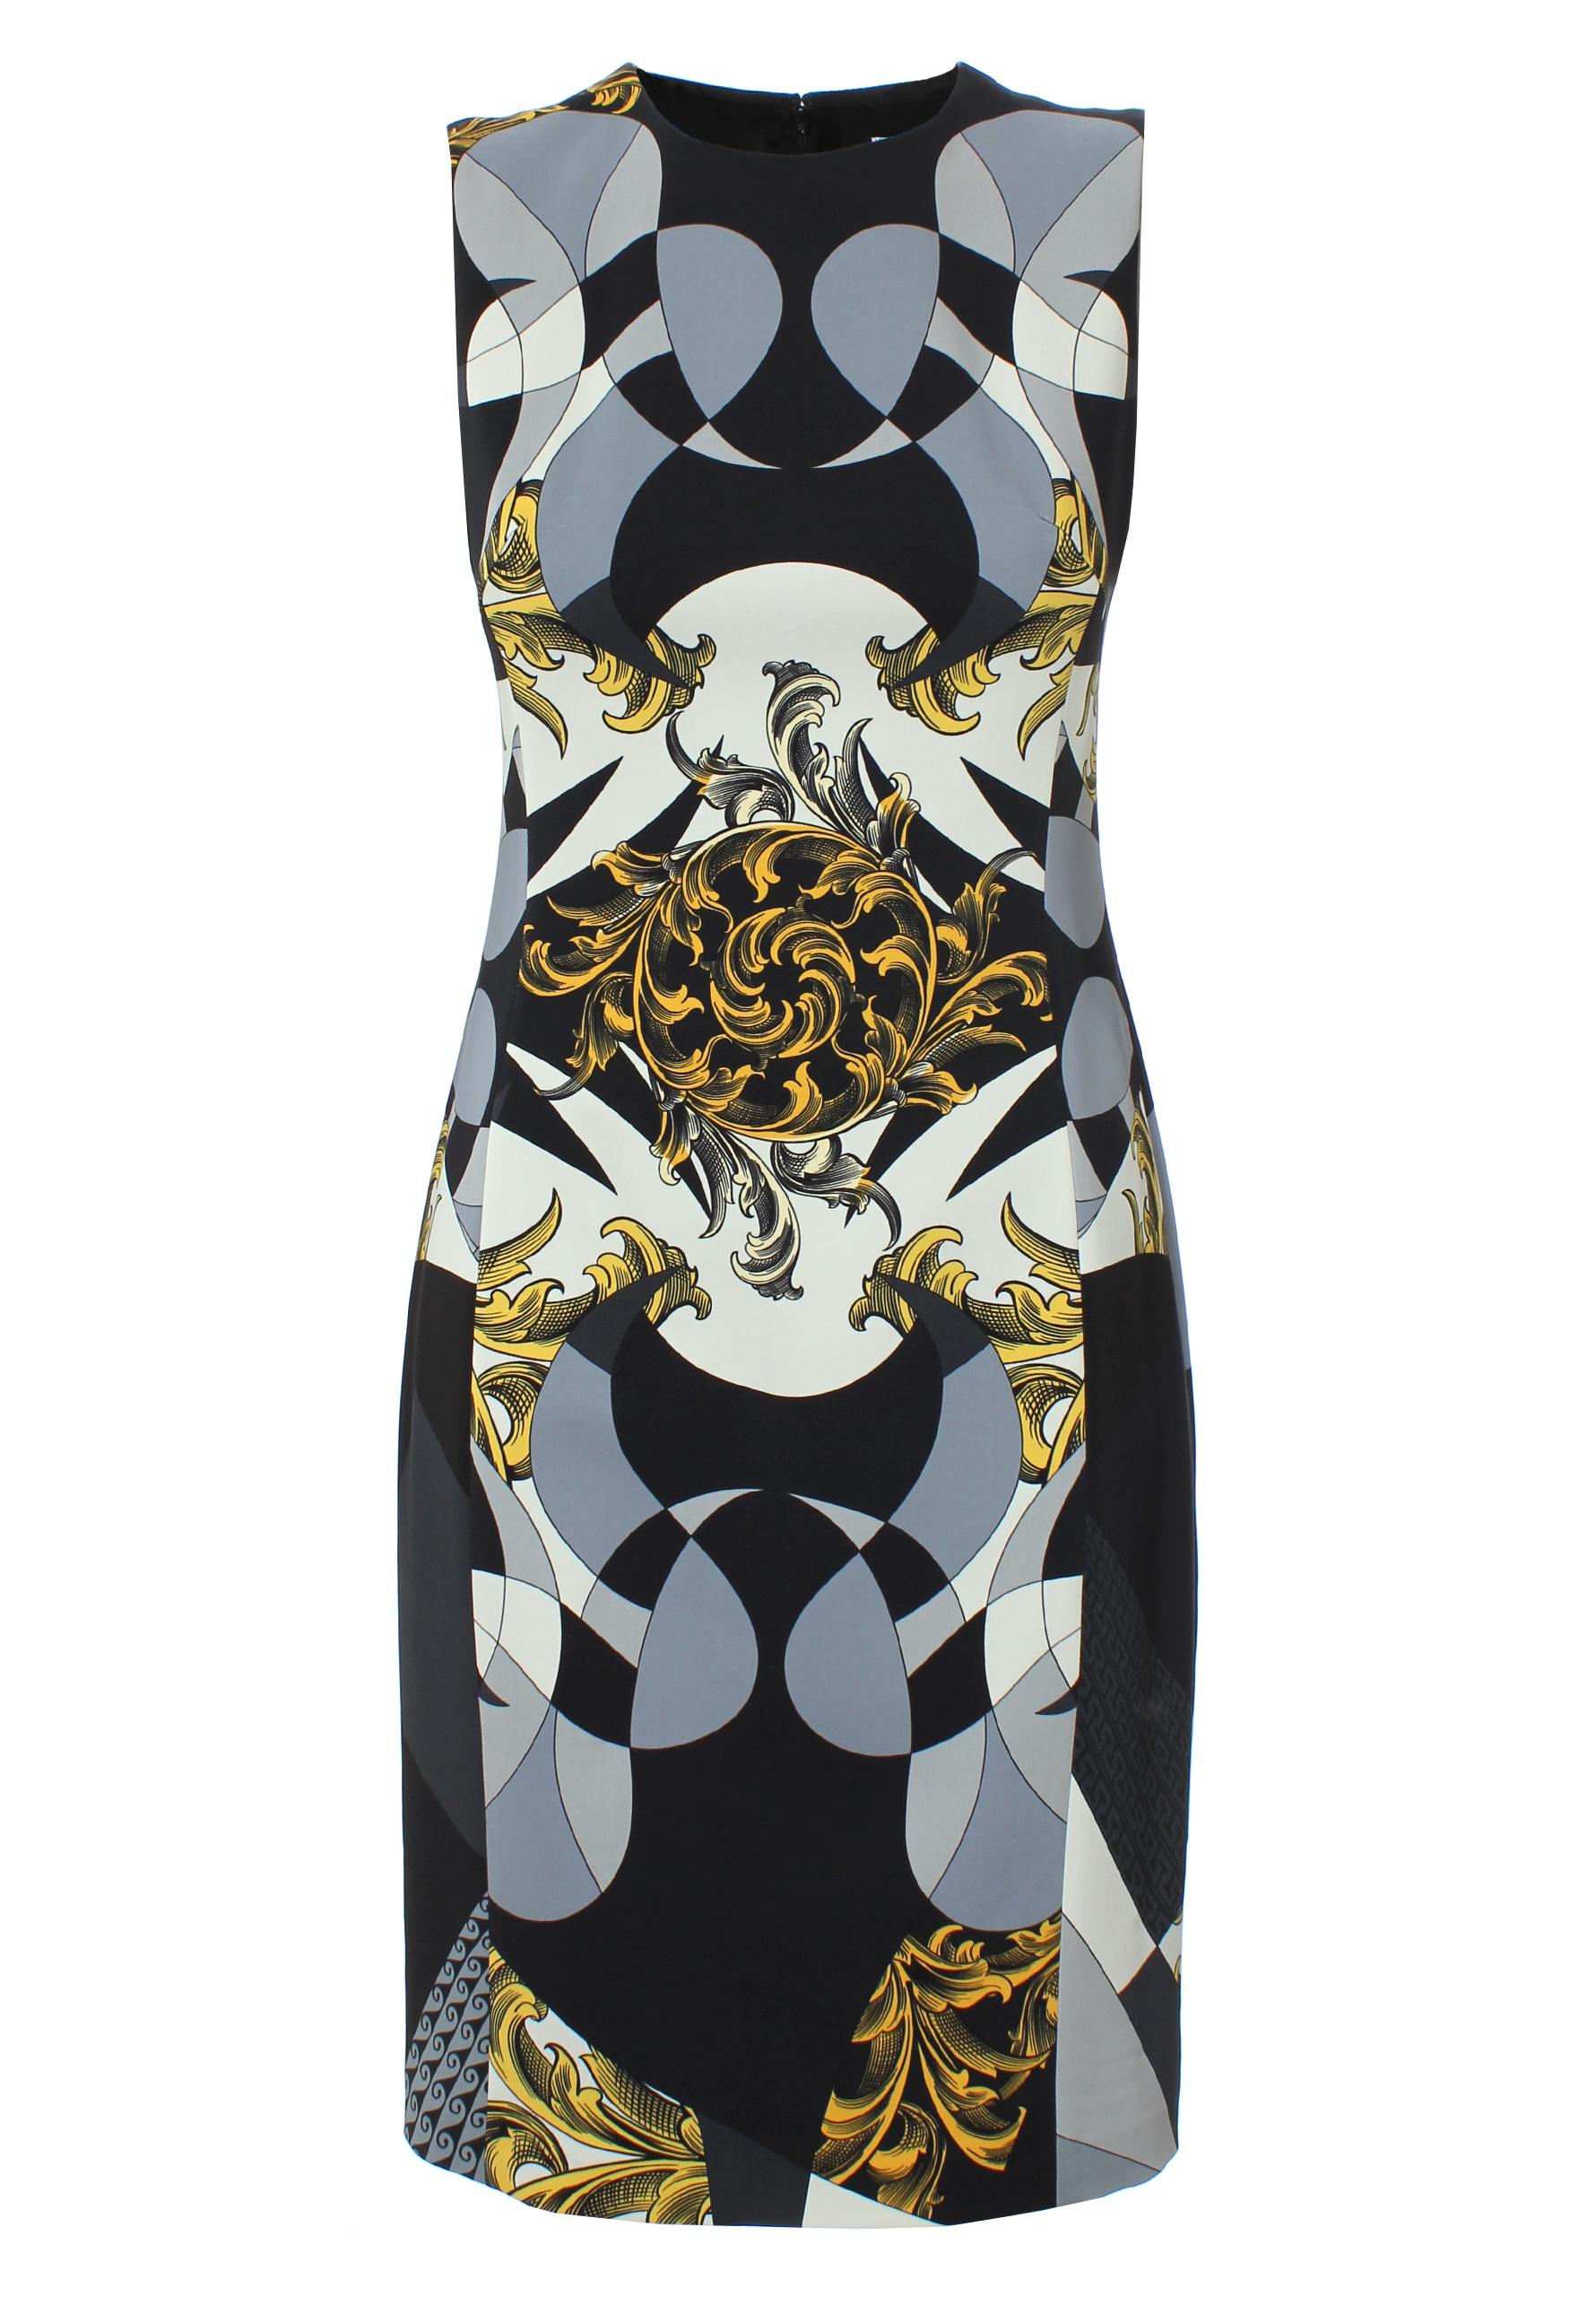 810e4b0317c7 Versace Regal Baroque Print Shift Dress Black/white/gold in Black - Lyst